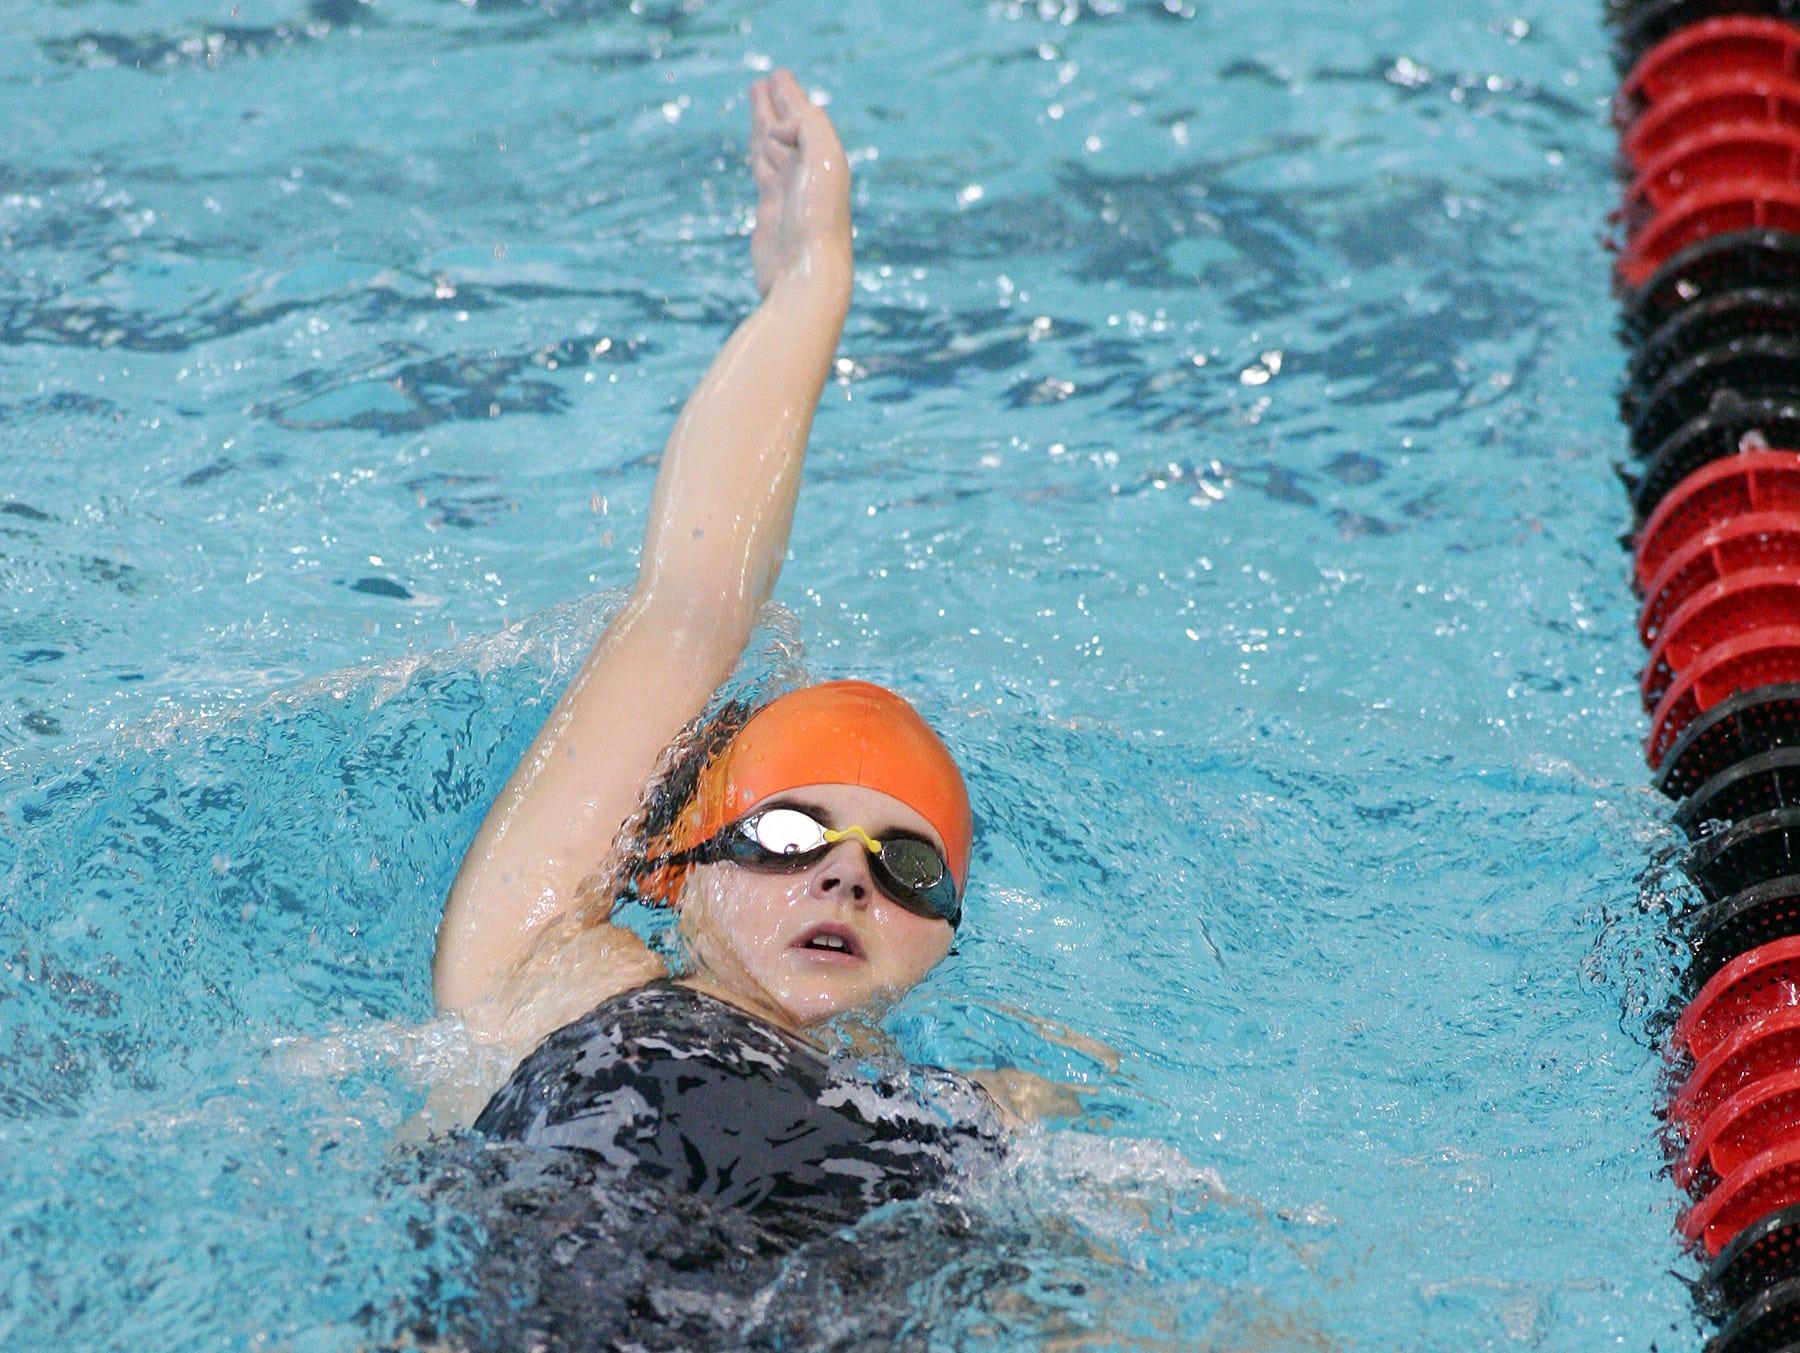 Watkins Memorial senior Hailey Miller practices her backstroke during practice Nov. 24 at Denison.